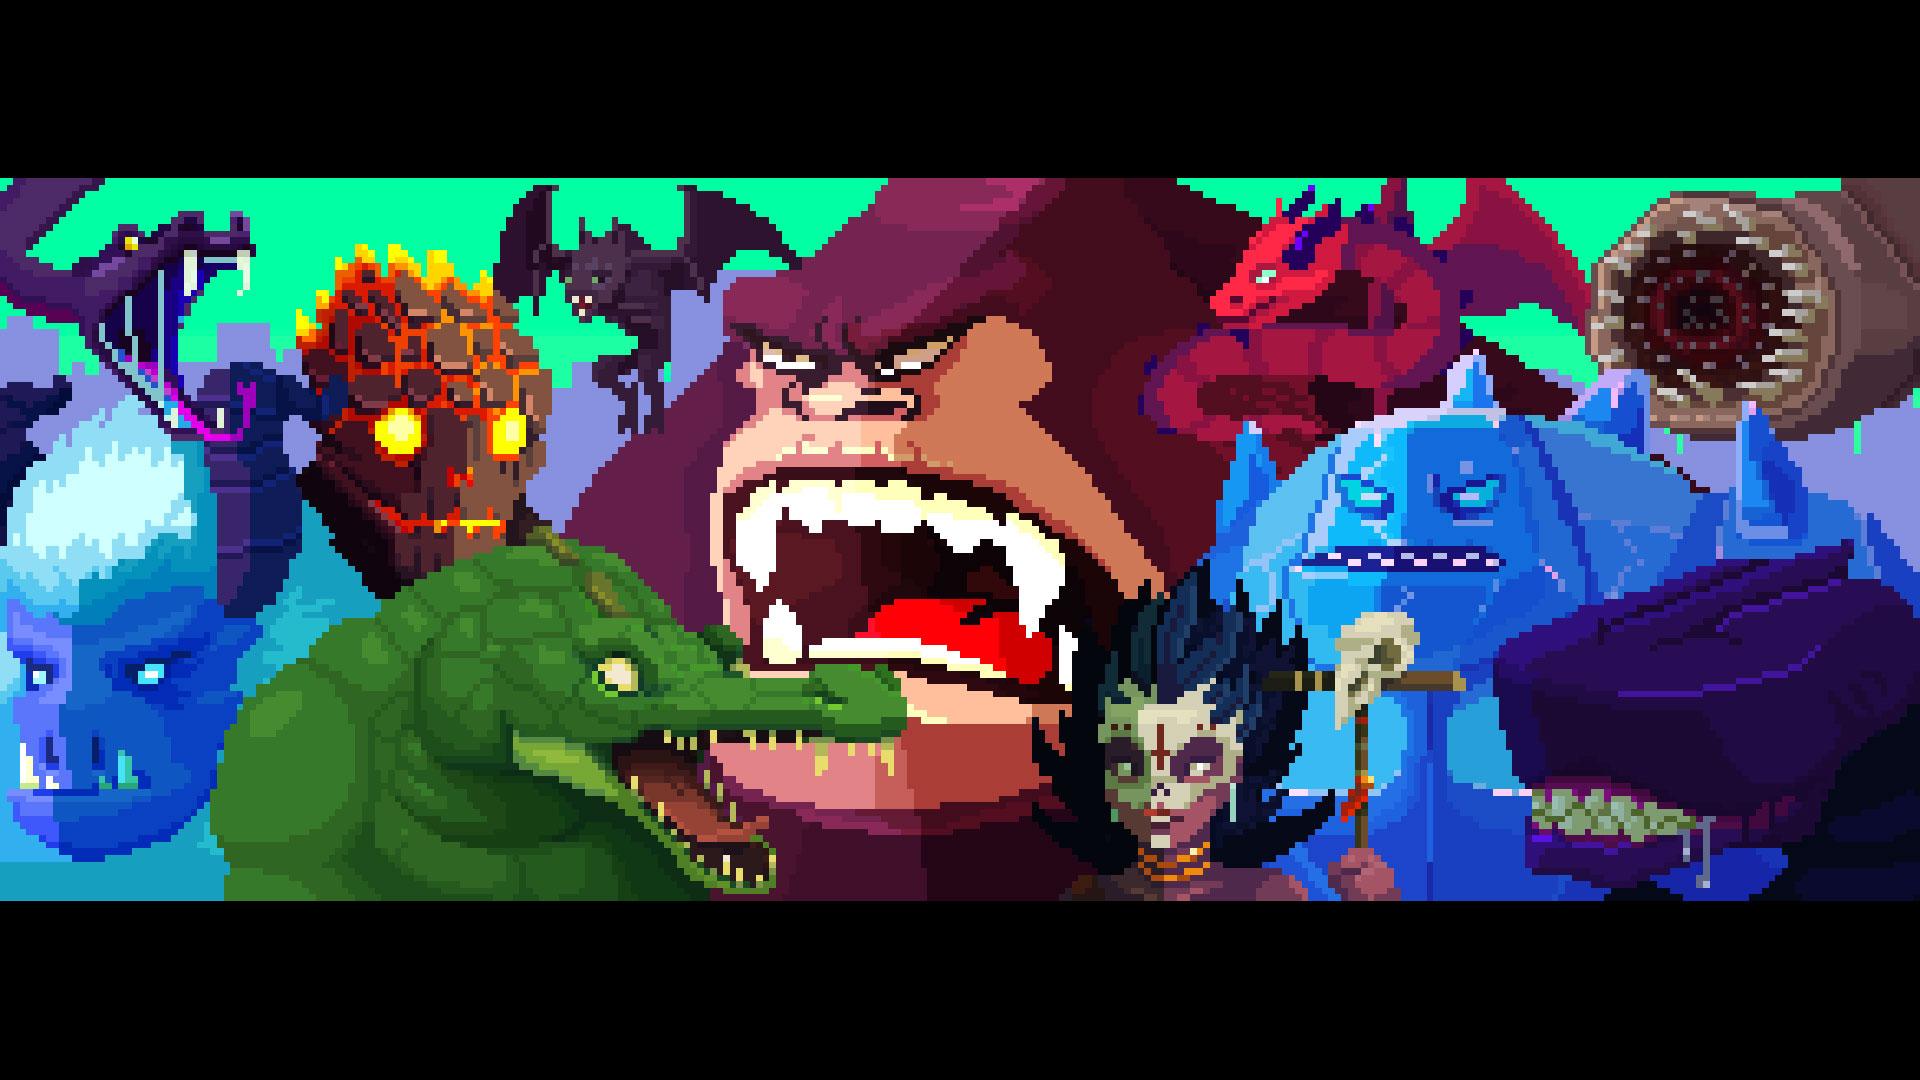 Ulasan Hero Express - GameSpace.com 1